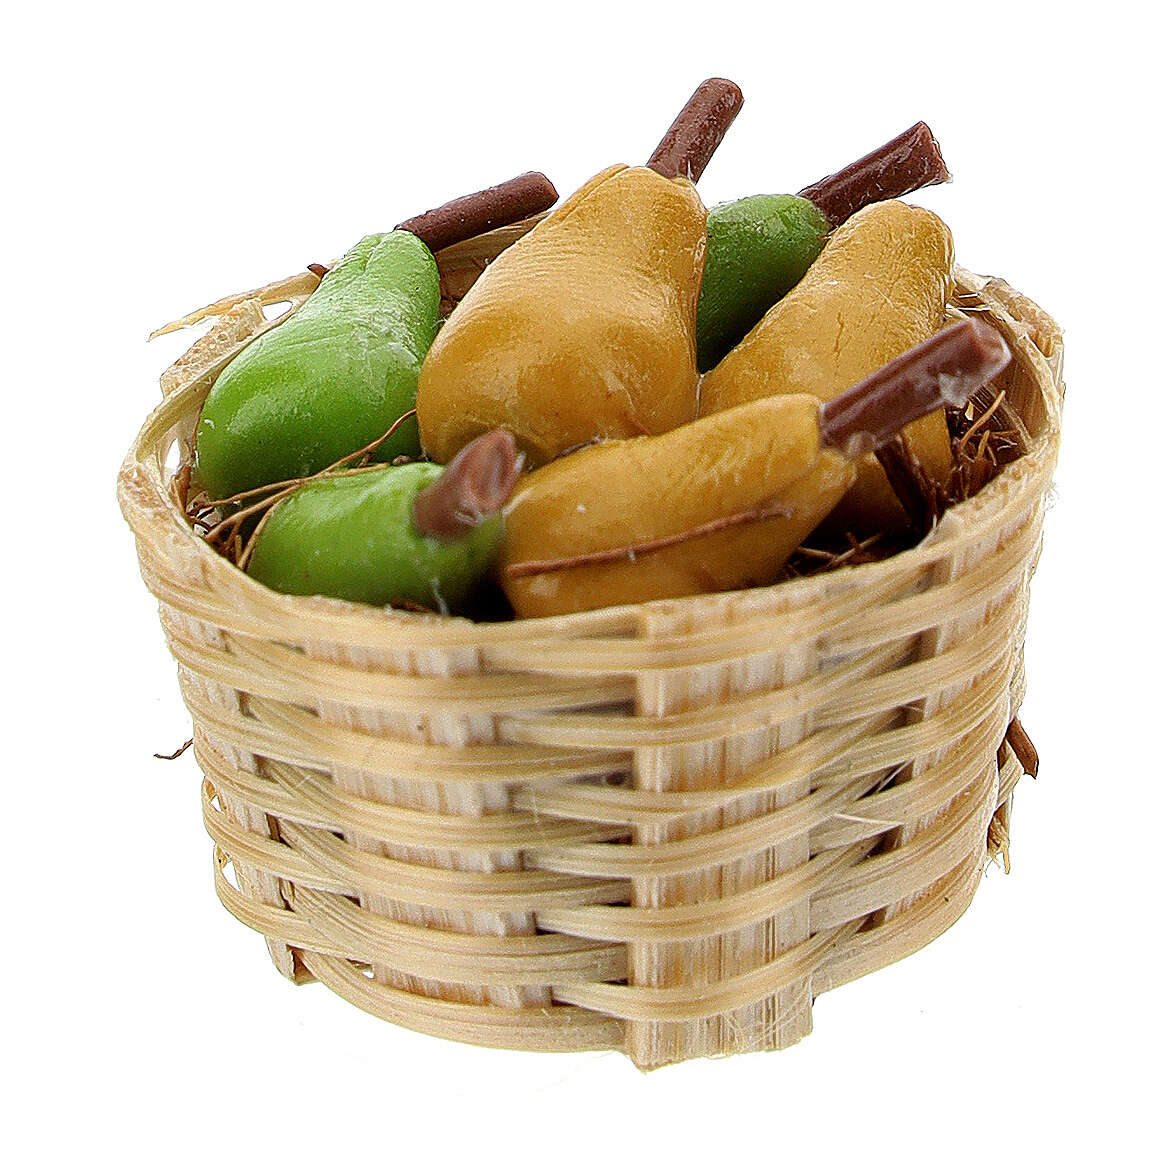 Basket of pears 3 pieces Nativity scene 6-8 cm 4